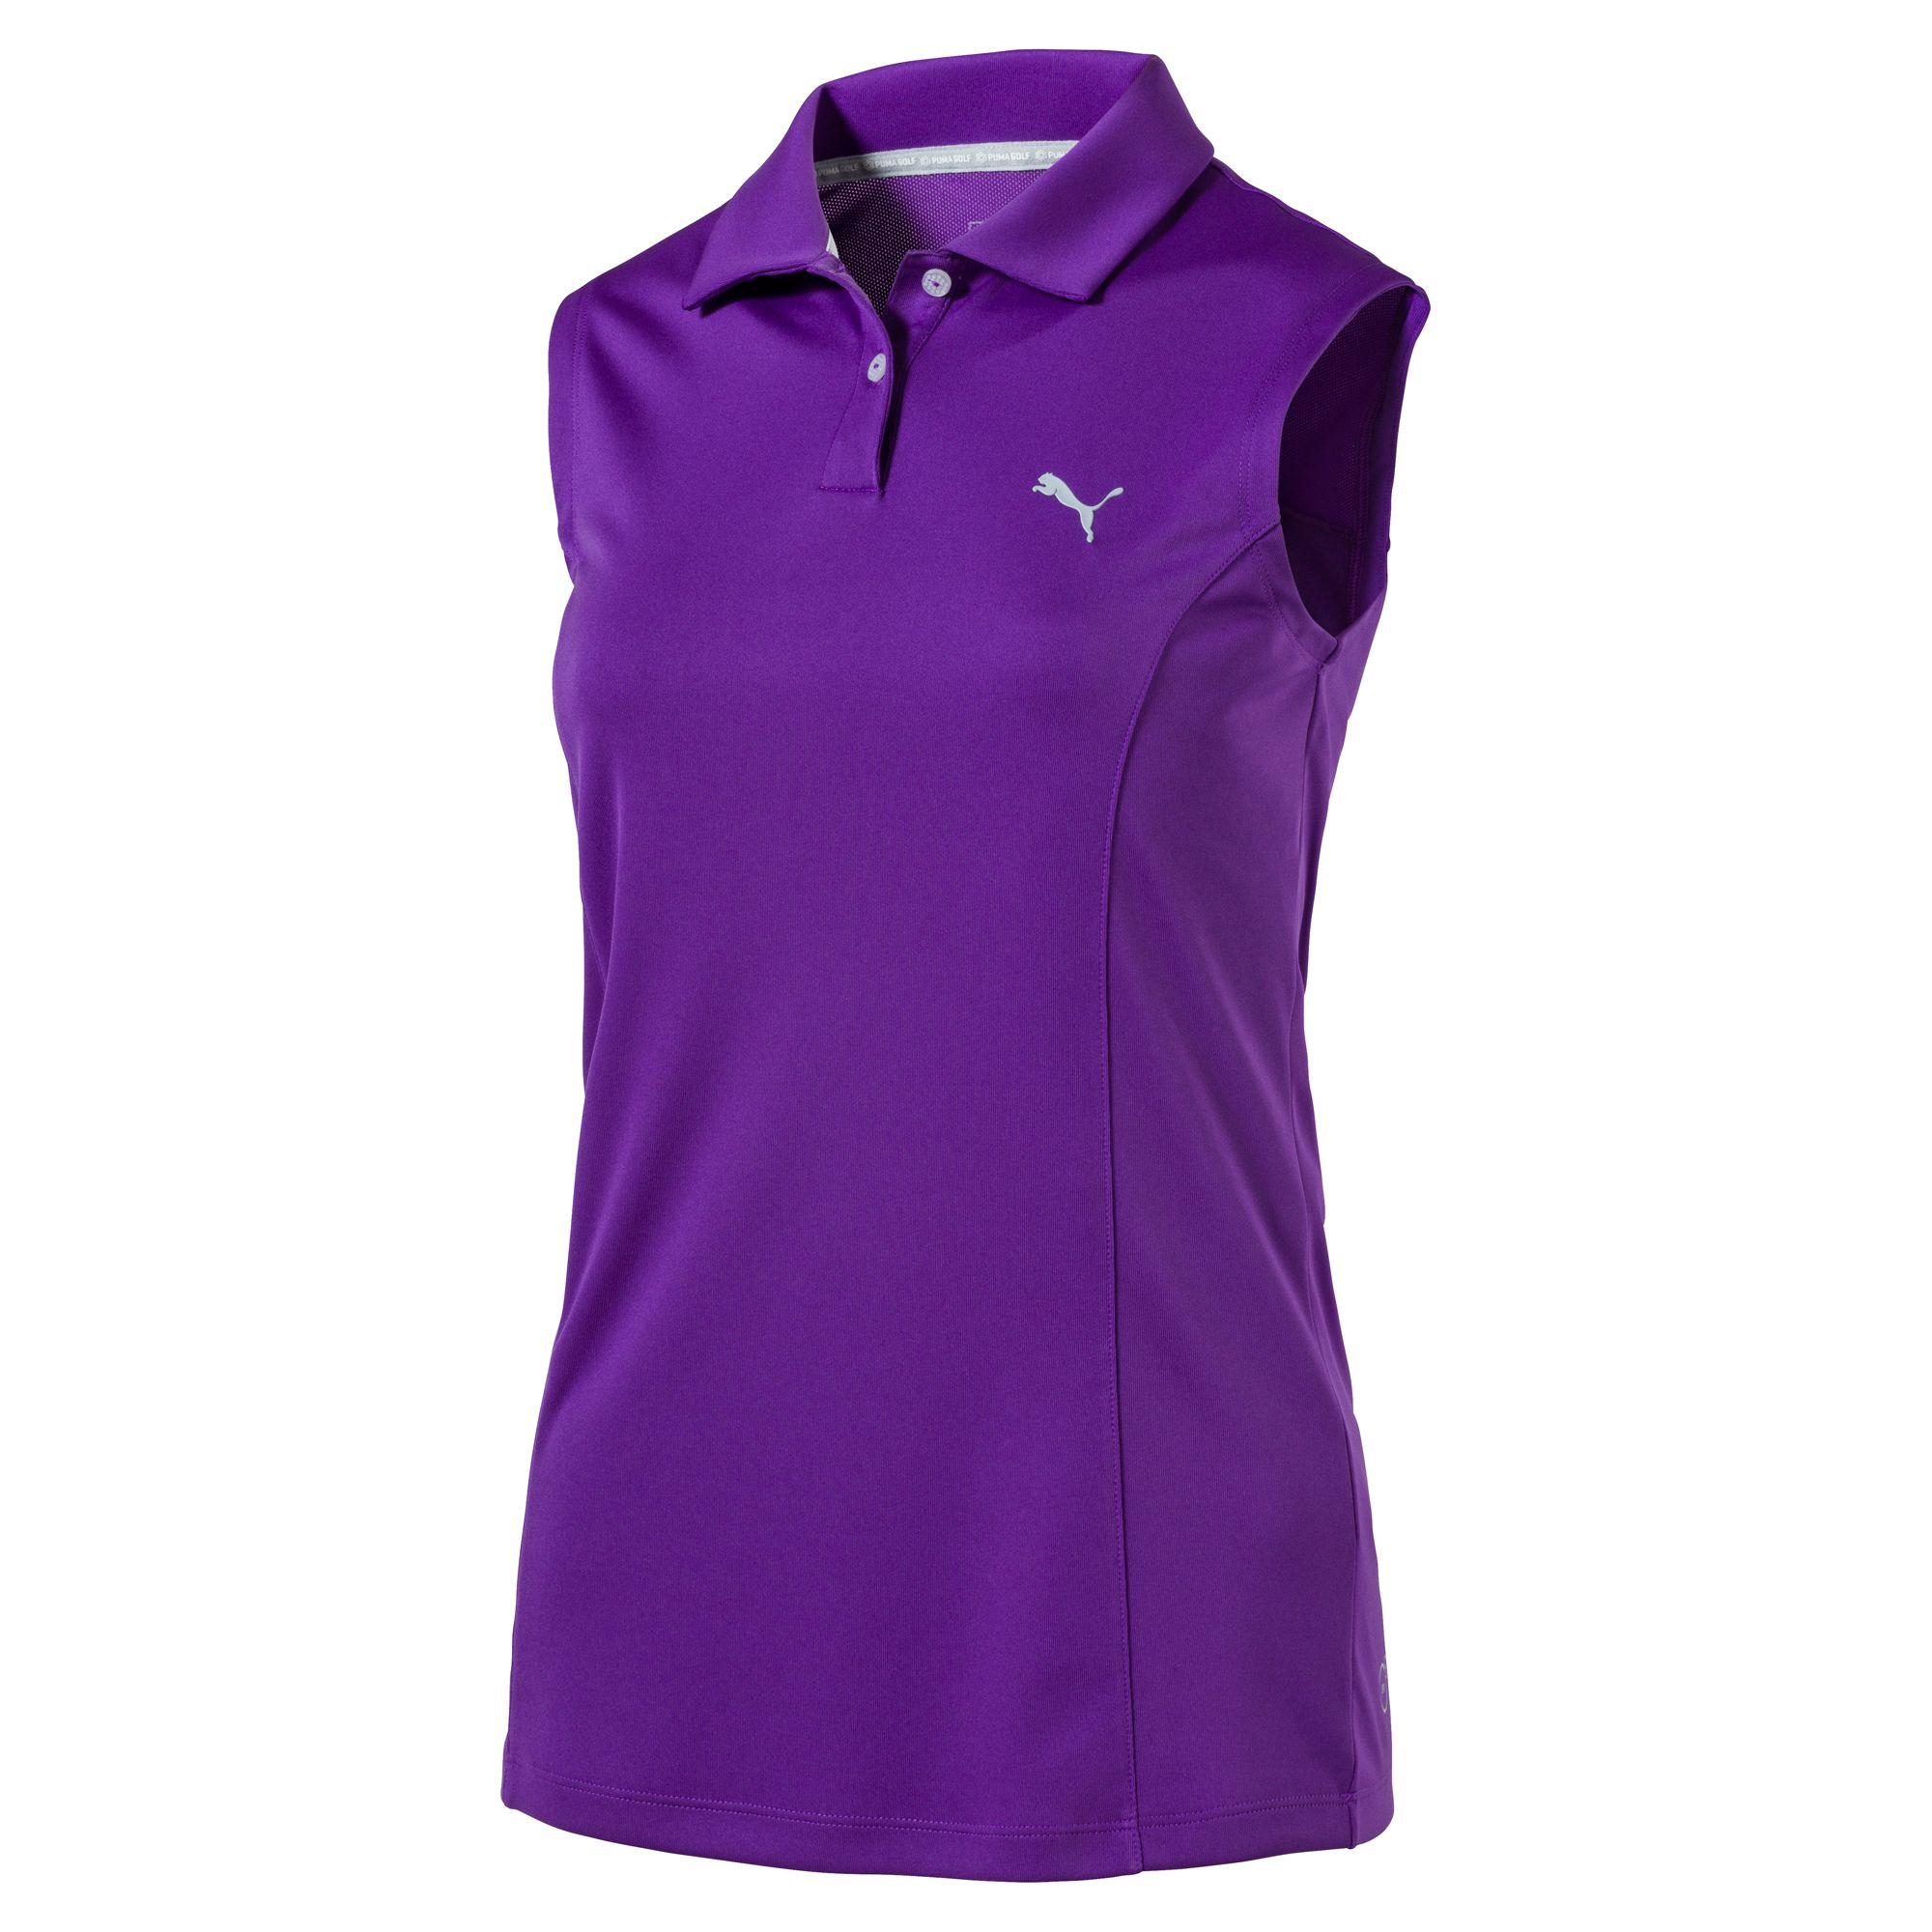 Women's Sleeveless Golf Polo Shirts